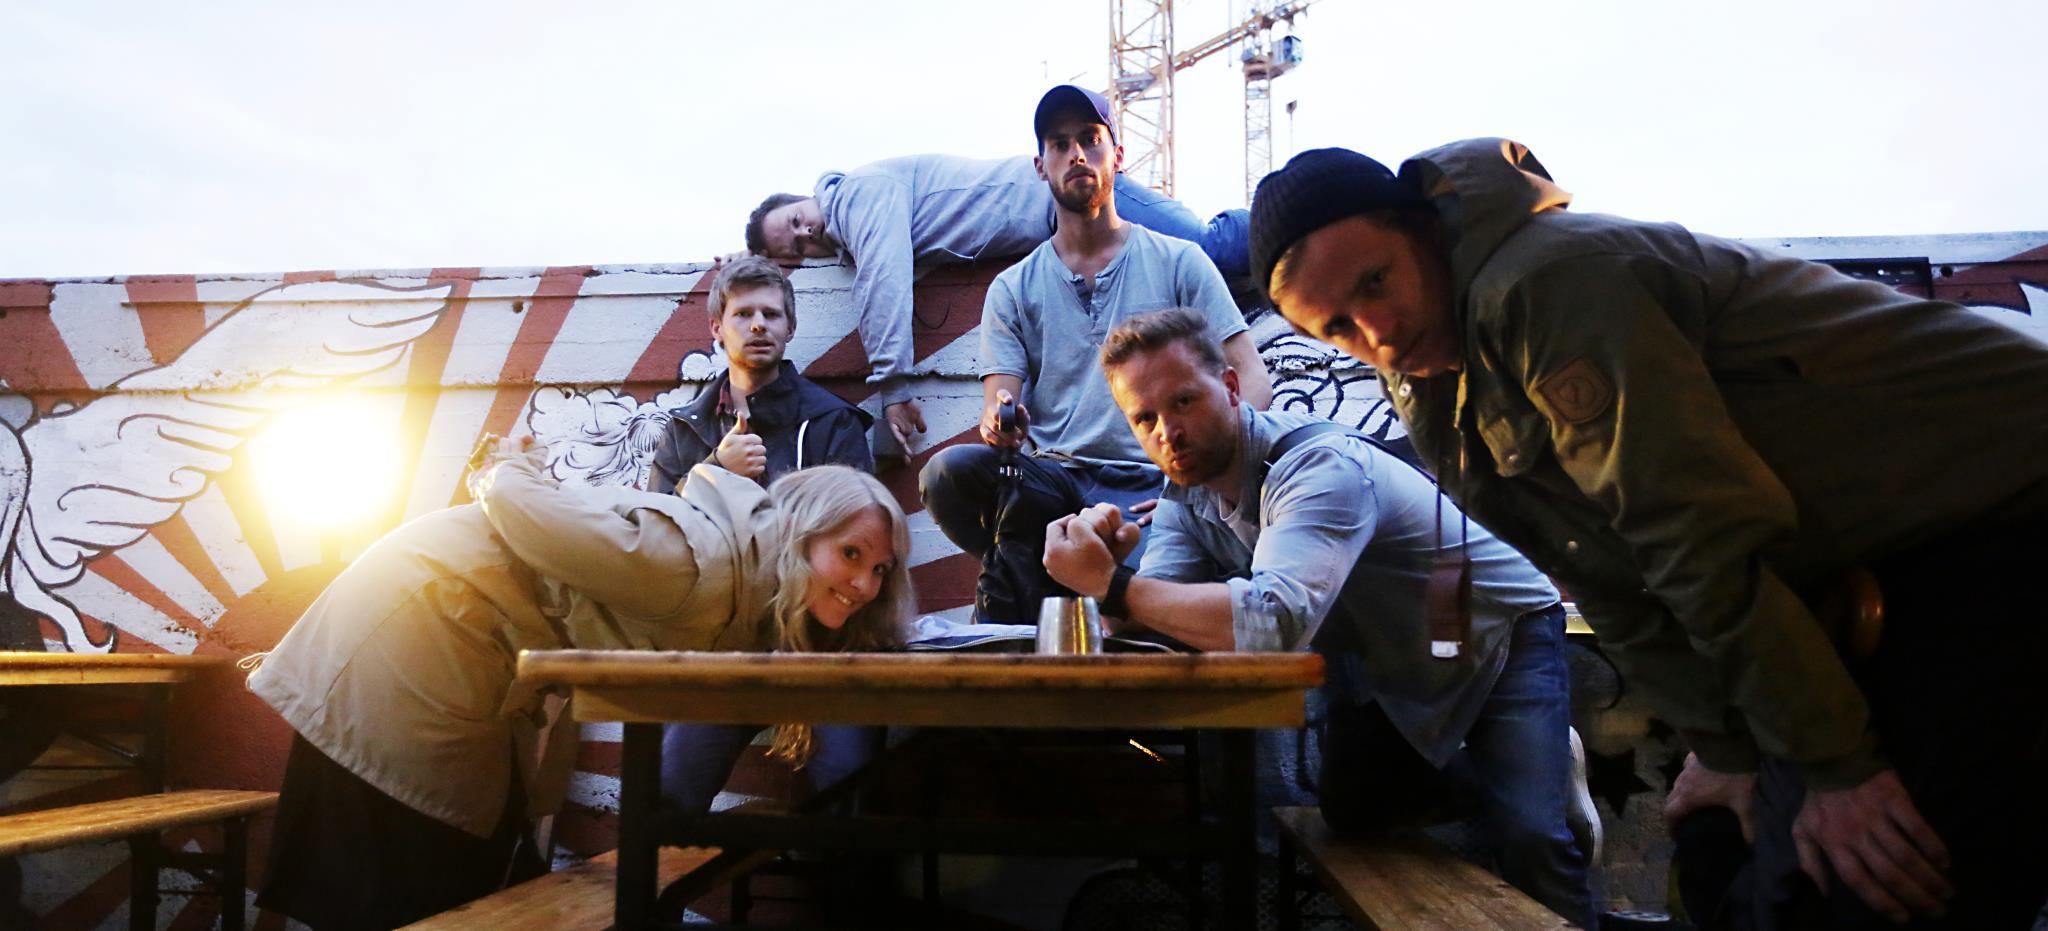 Shuffleboardin' Oslo: Catrine Bøhler, Aleksander Andersen, Johan Breines, Lars Øverli, Me, Martin SLottemo Lyngstad